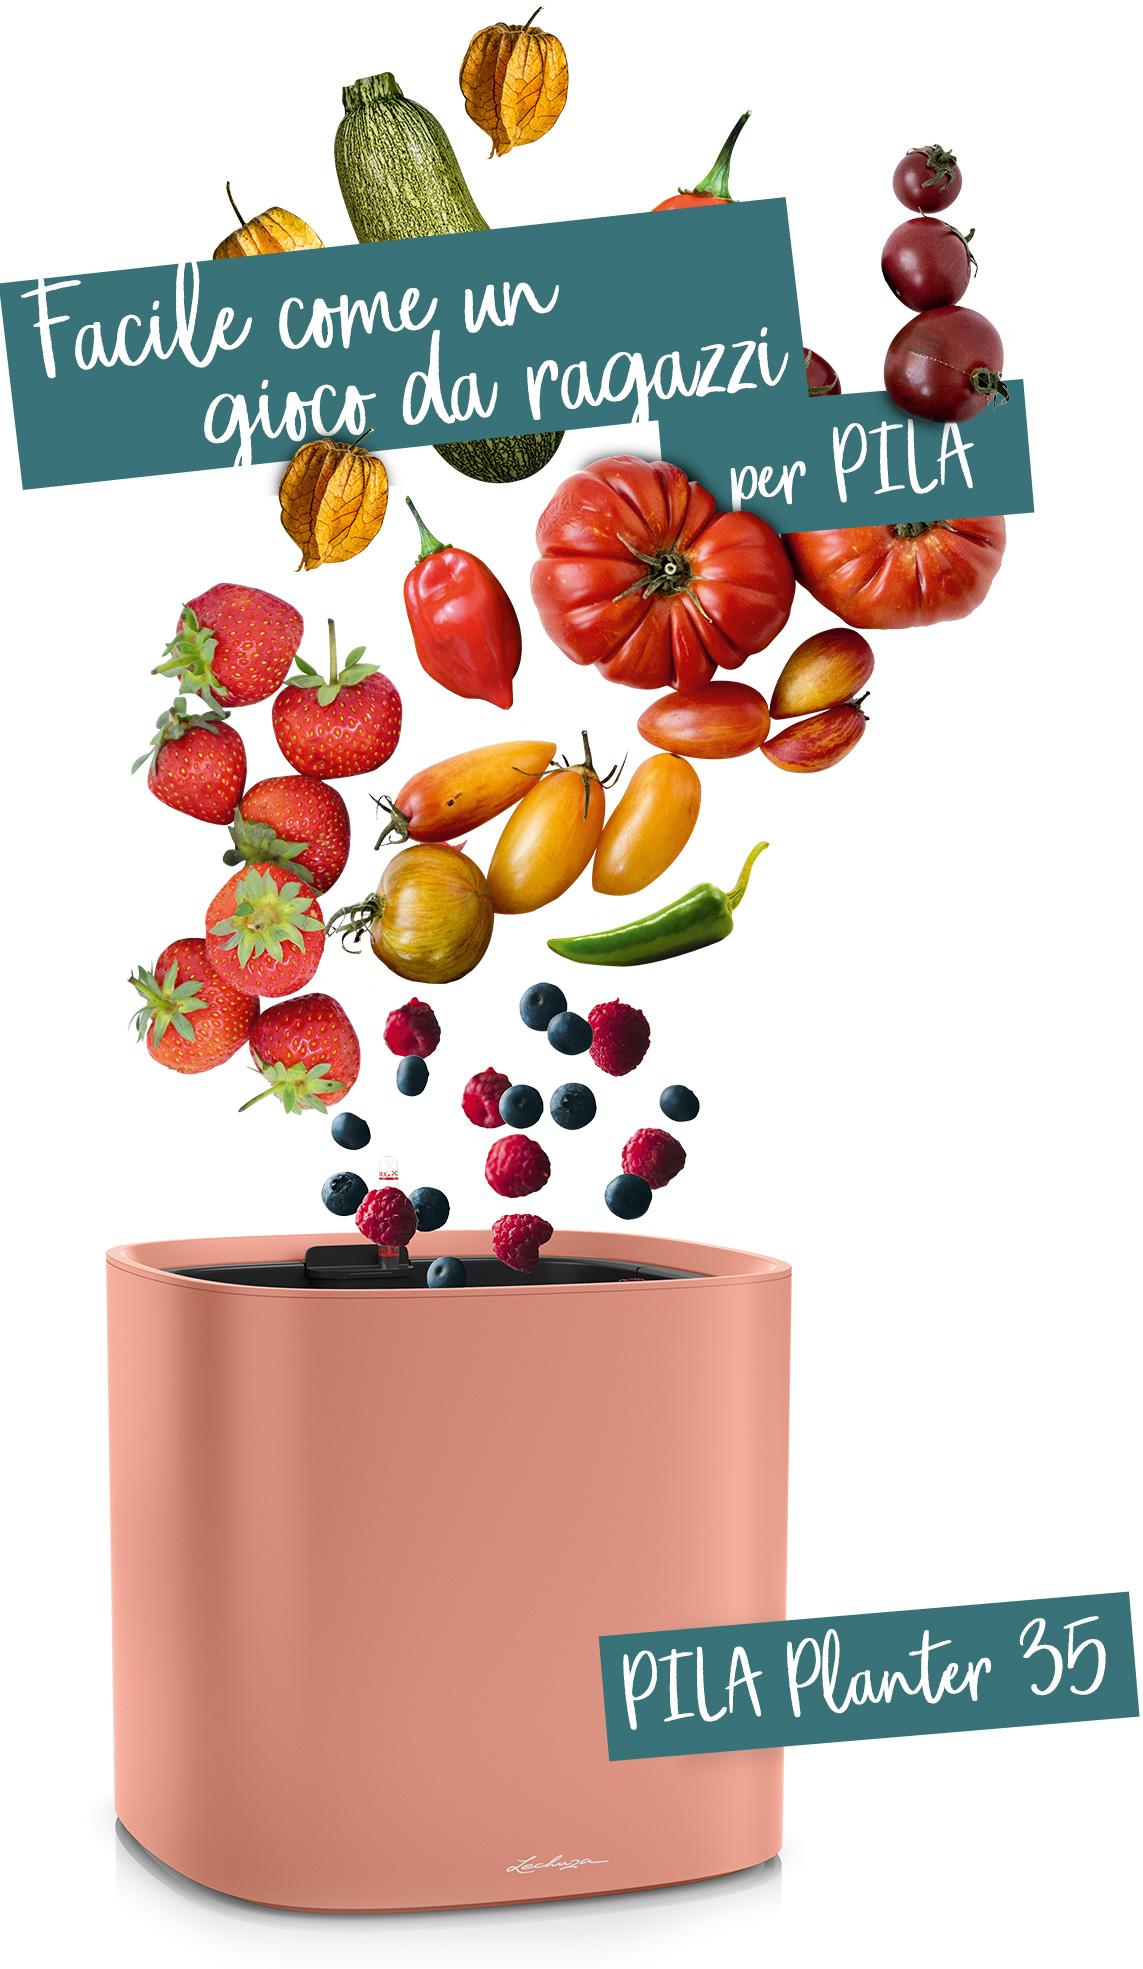 PILA Planter 35 raccomandato per frutta e verdura